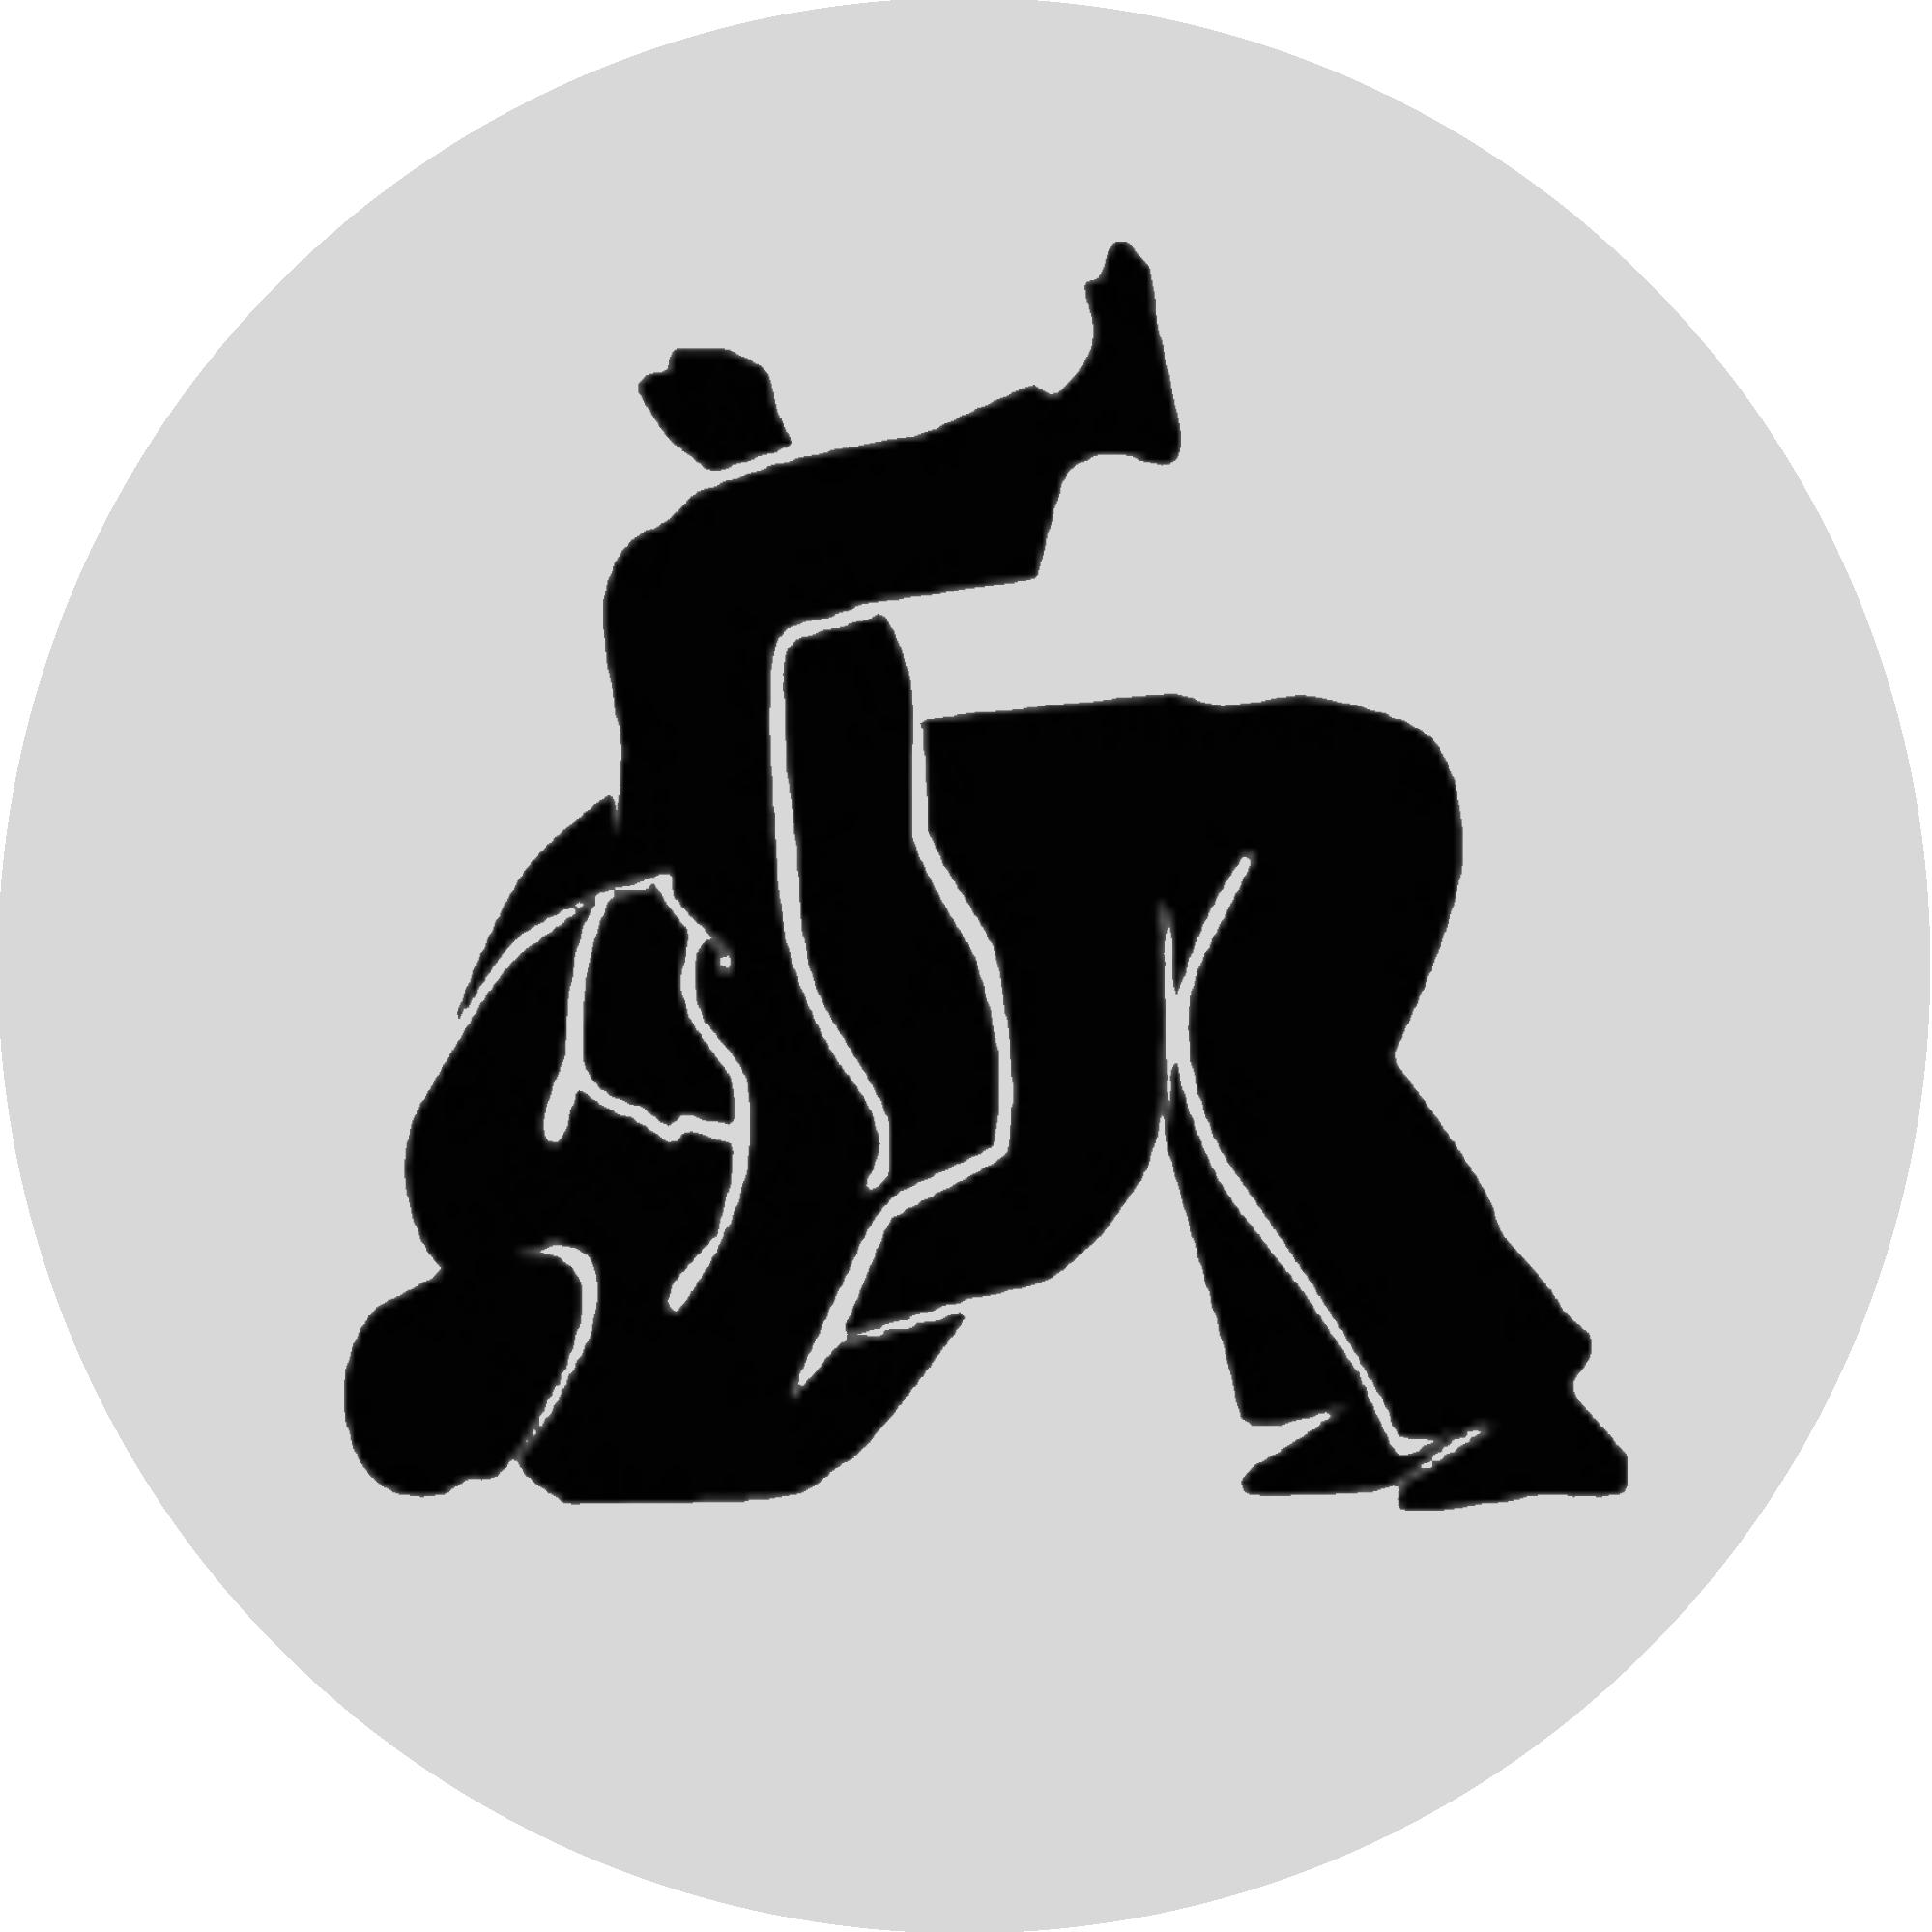 ji jitsu